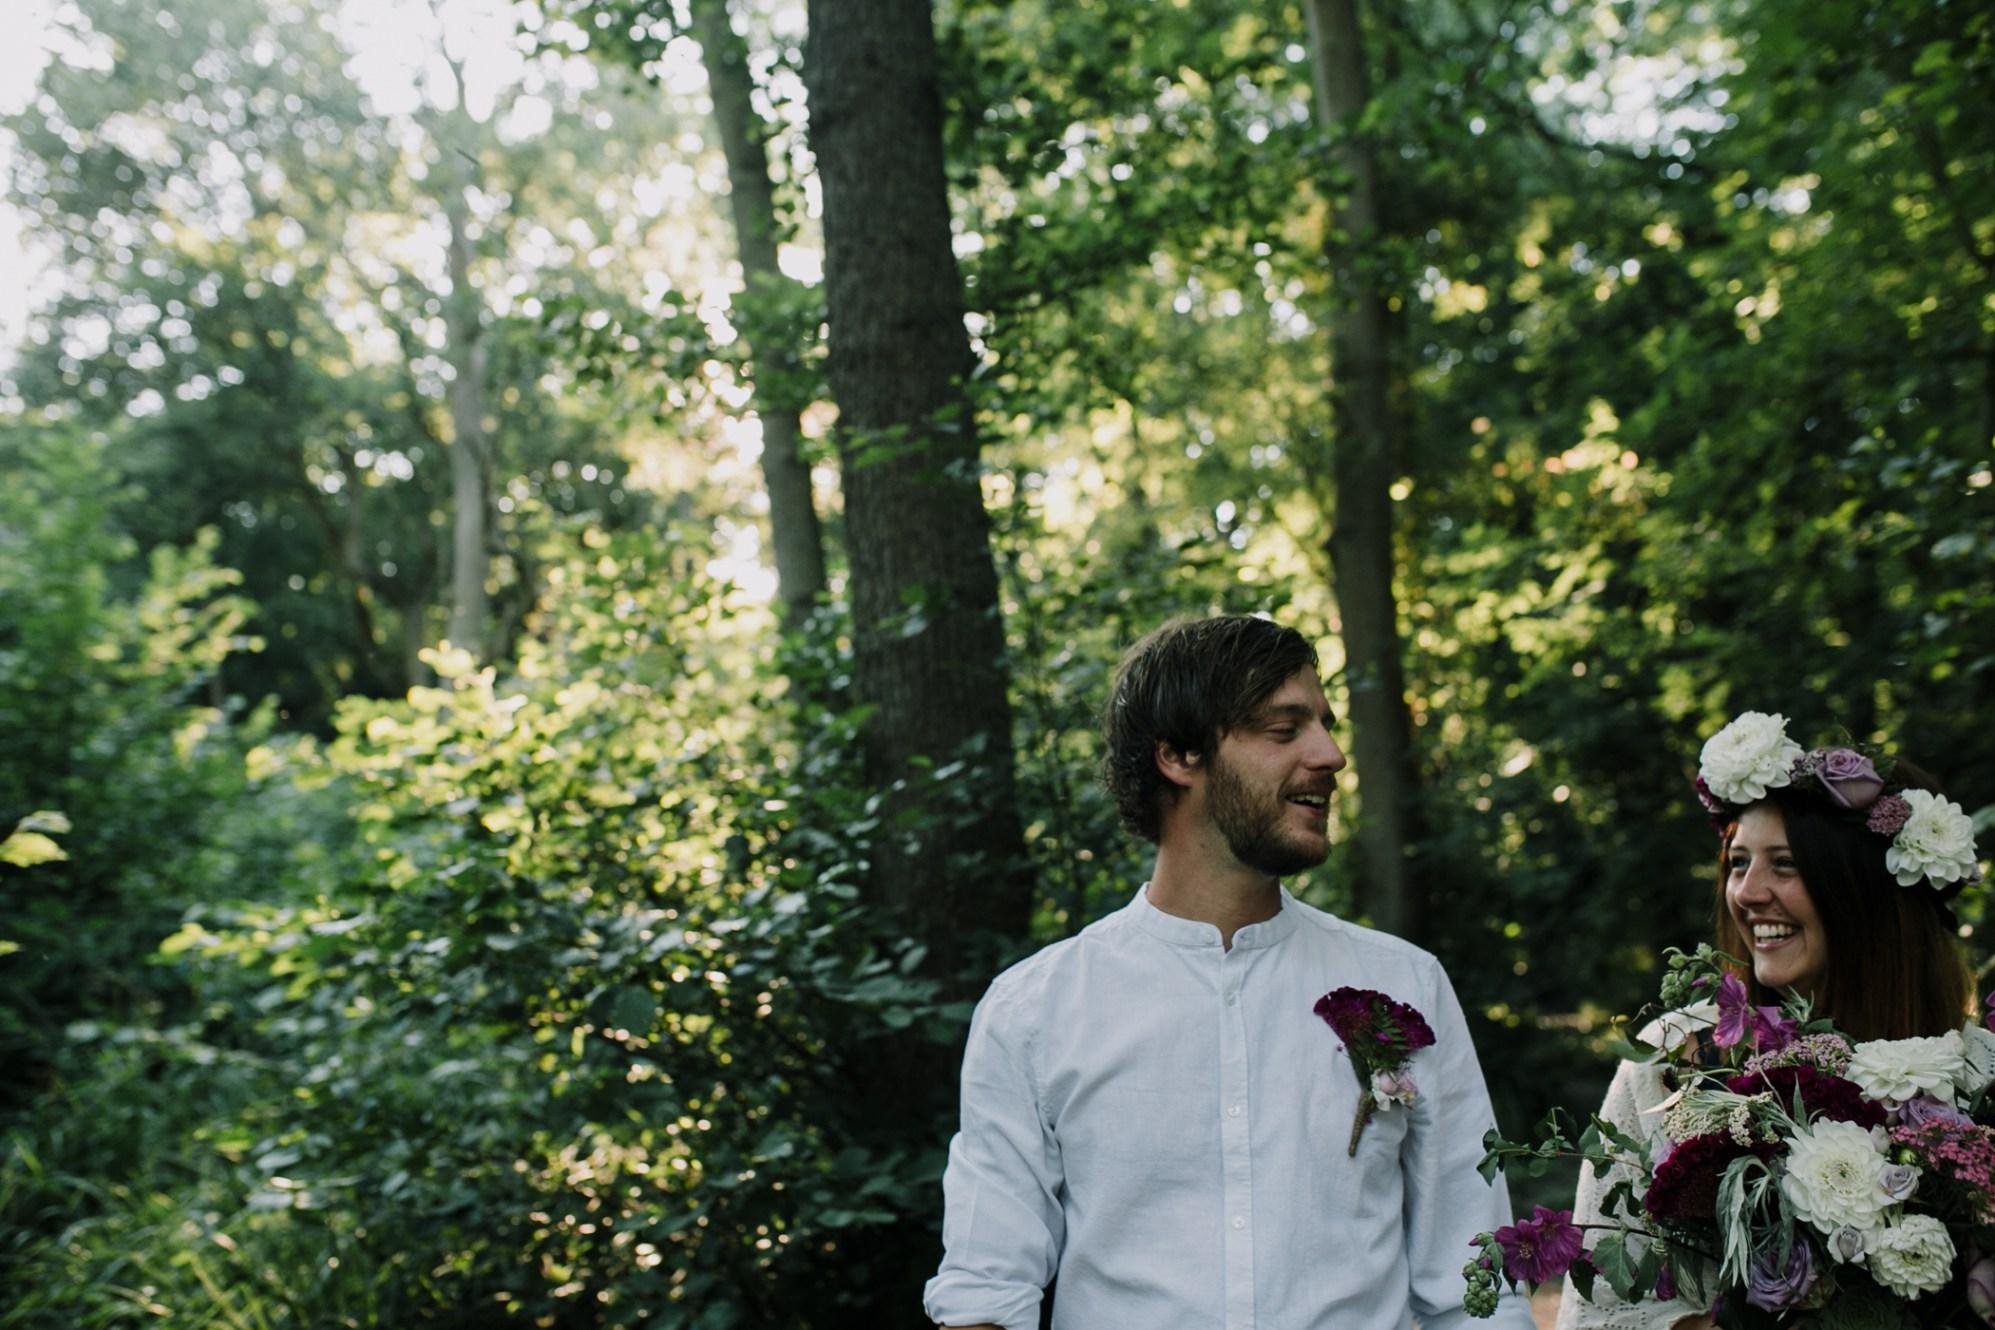 Caroline Goosey - alternative wedding photography - engagement shoot 7